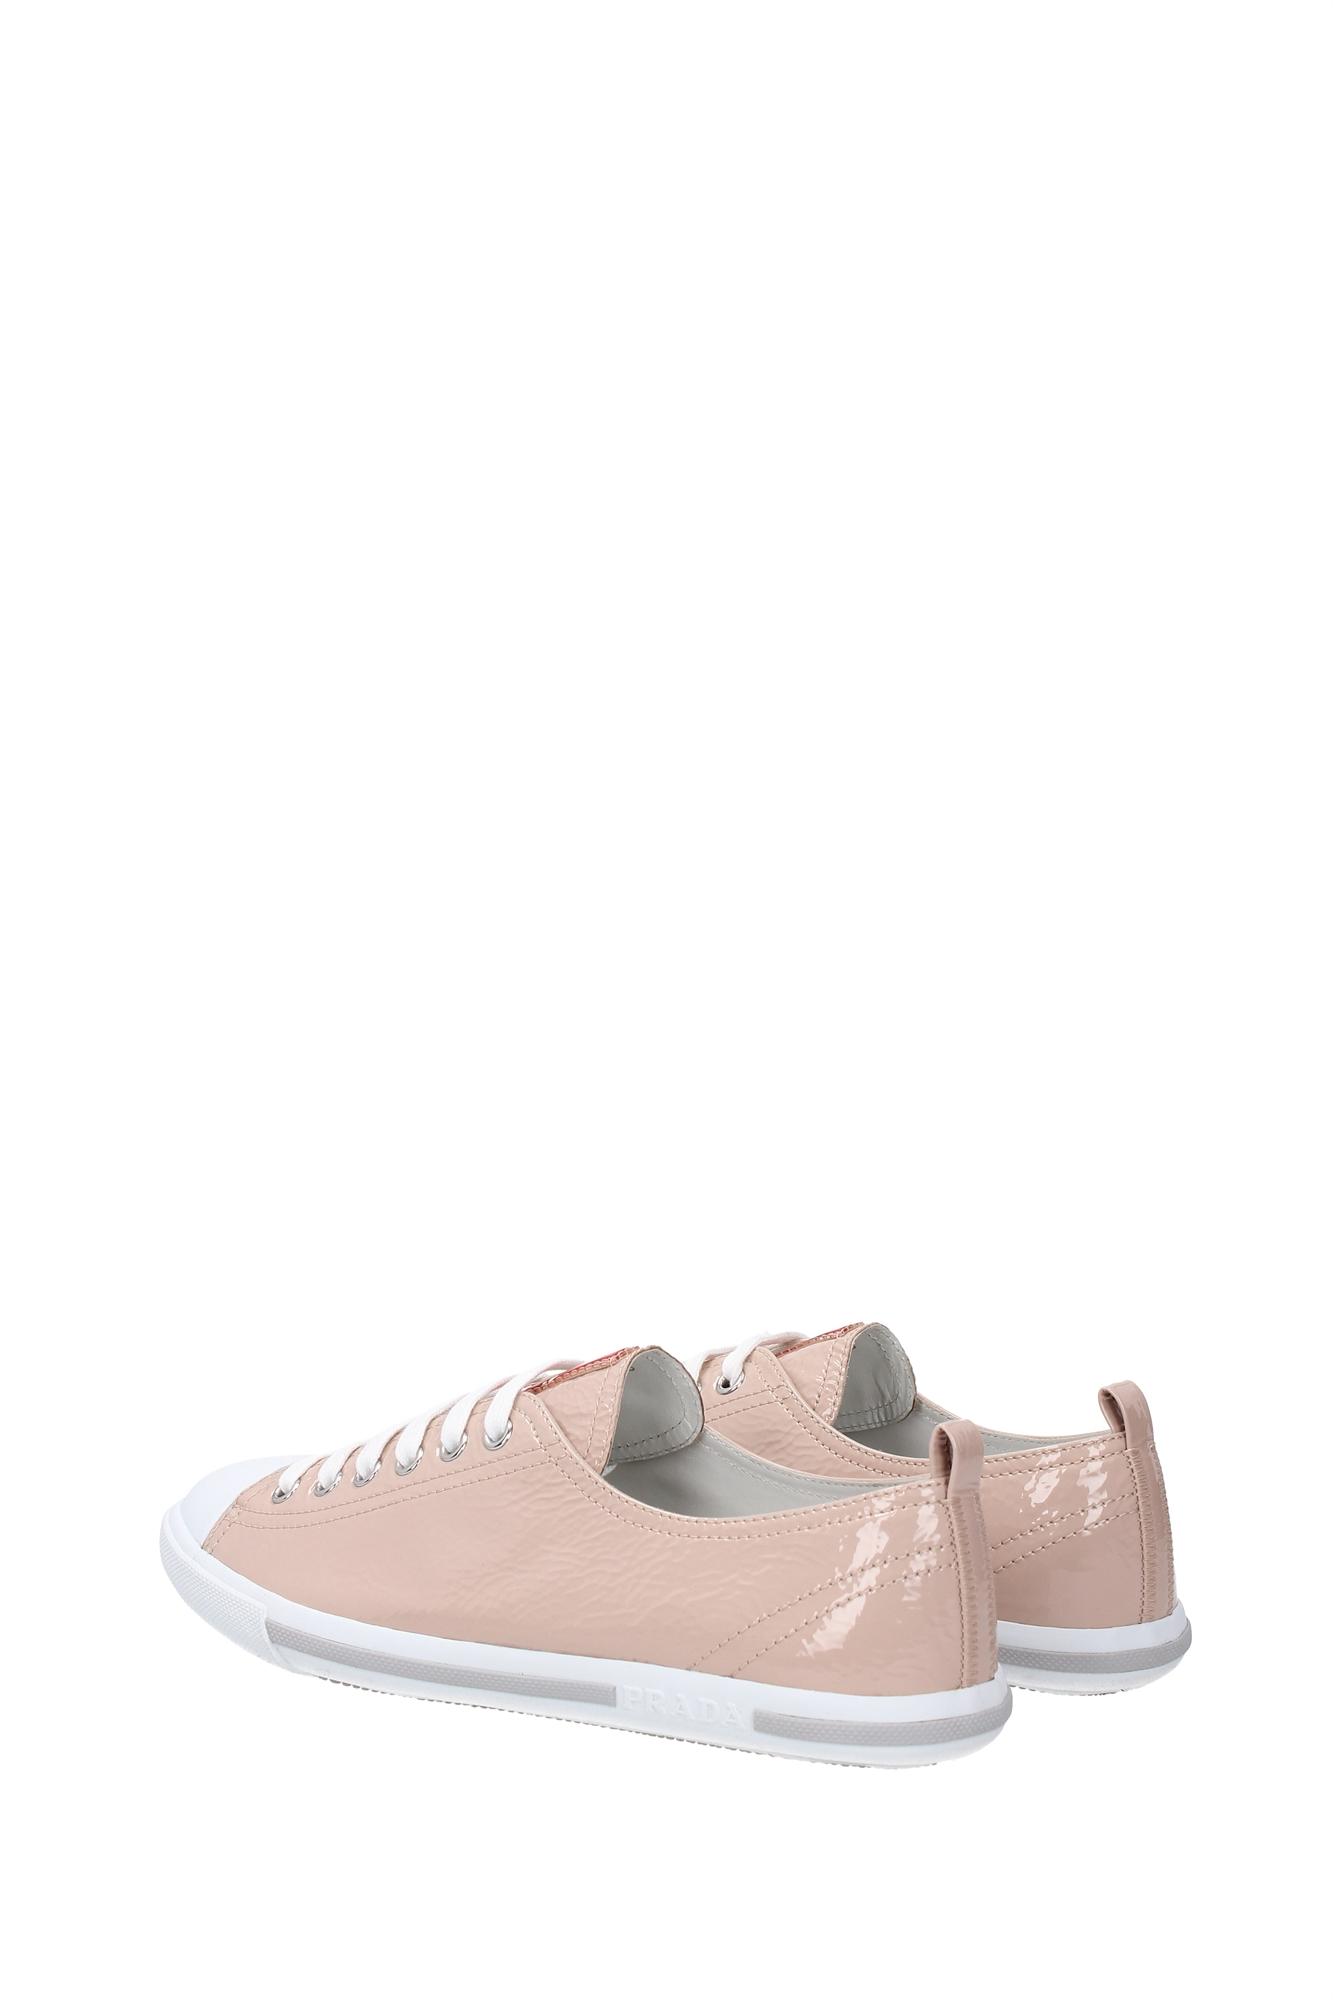 sneakers prada damen lackleder rosa 3e5811cipria ebay. Black Bedroom Furniture Sets. Home Design Ideas